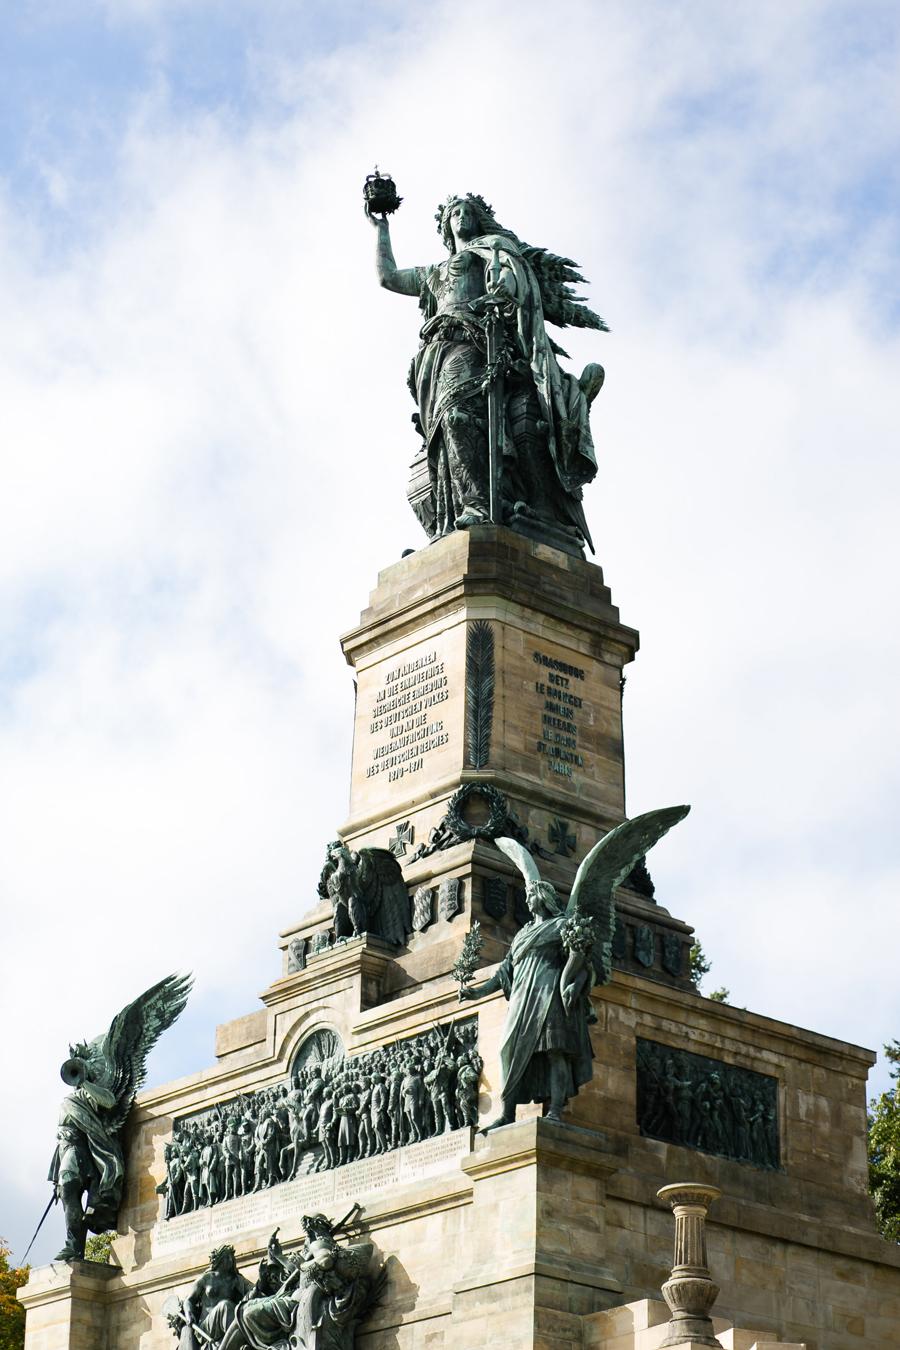 Germania Statue of Rudesheim Germany - Entouriste